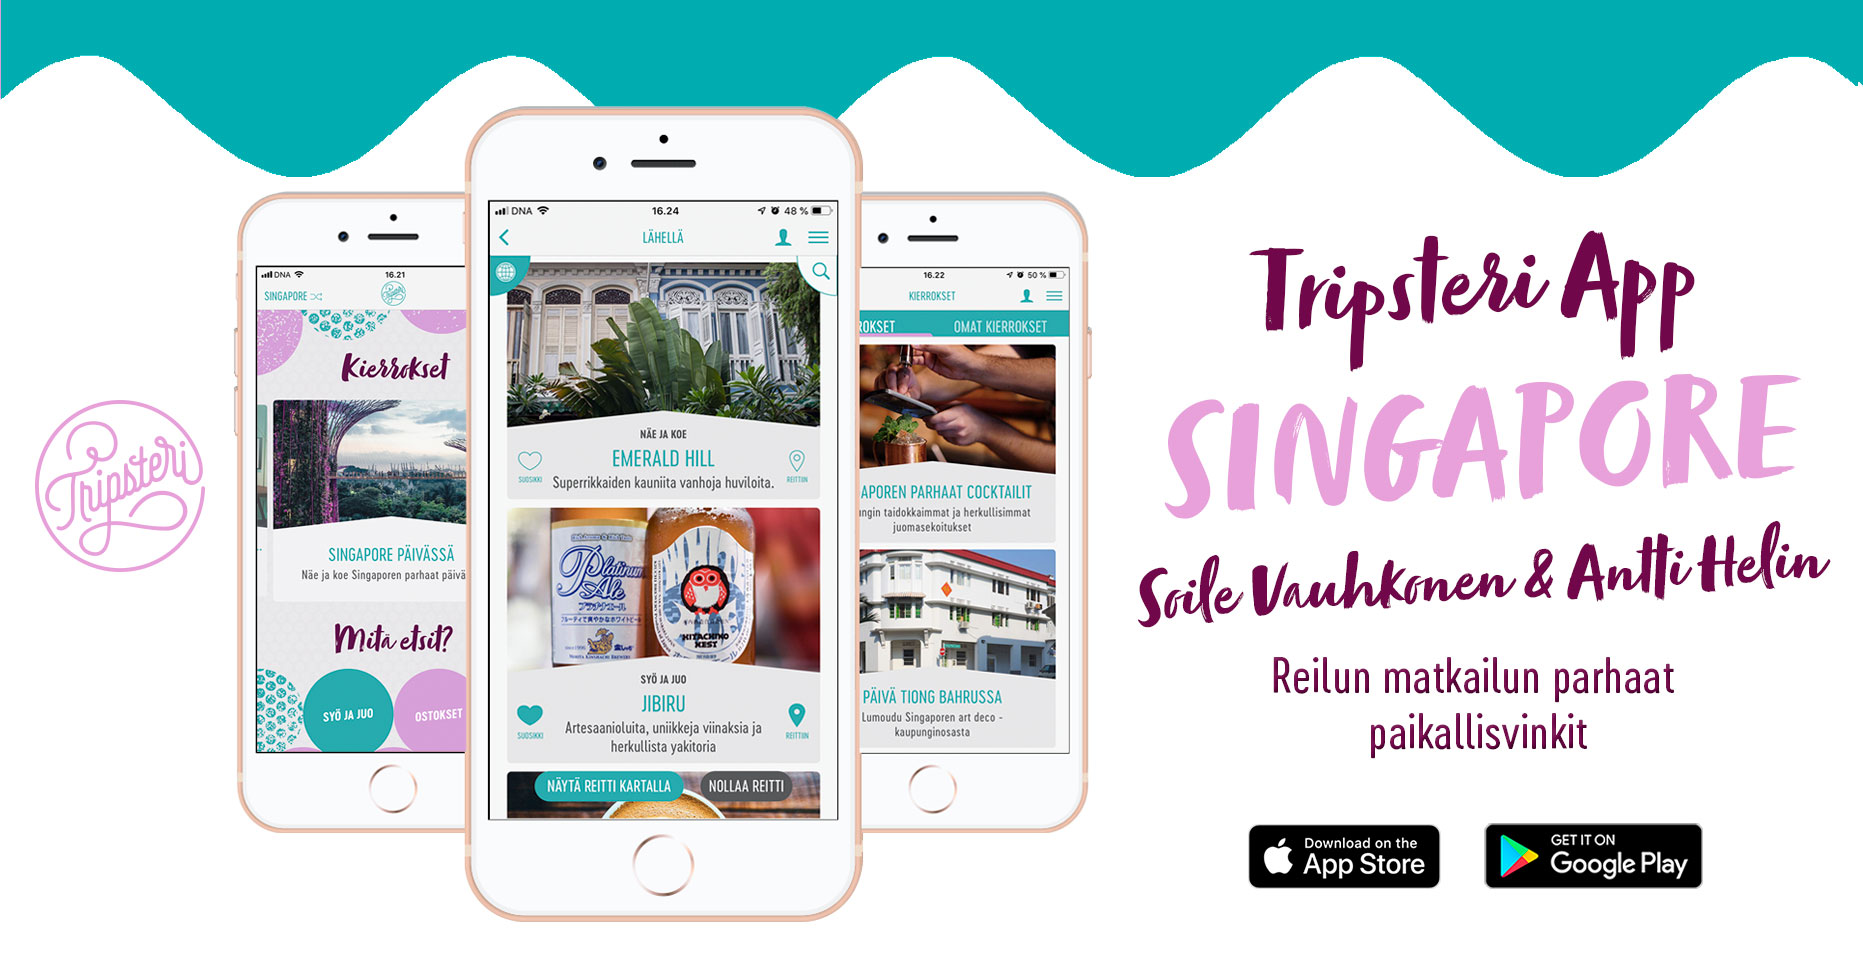 Tripsteri App Singapore banneri